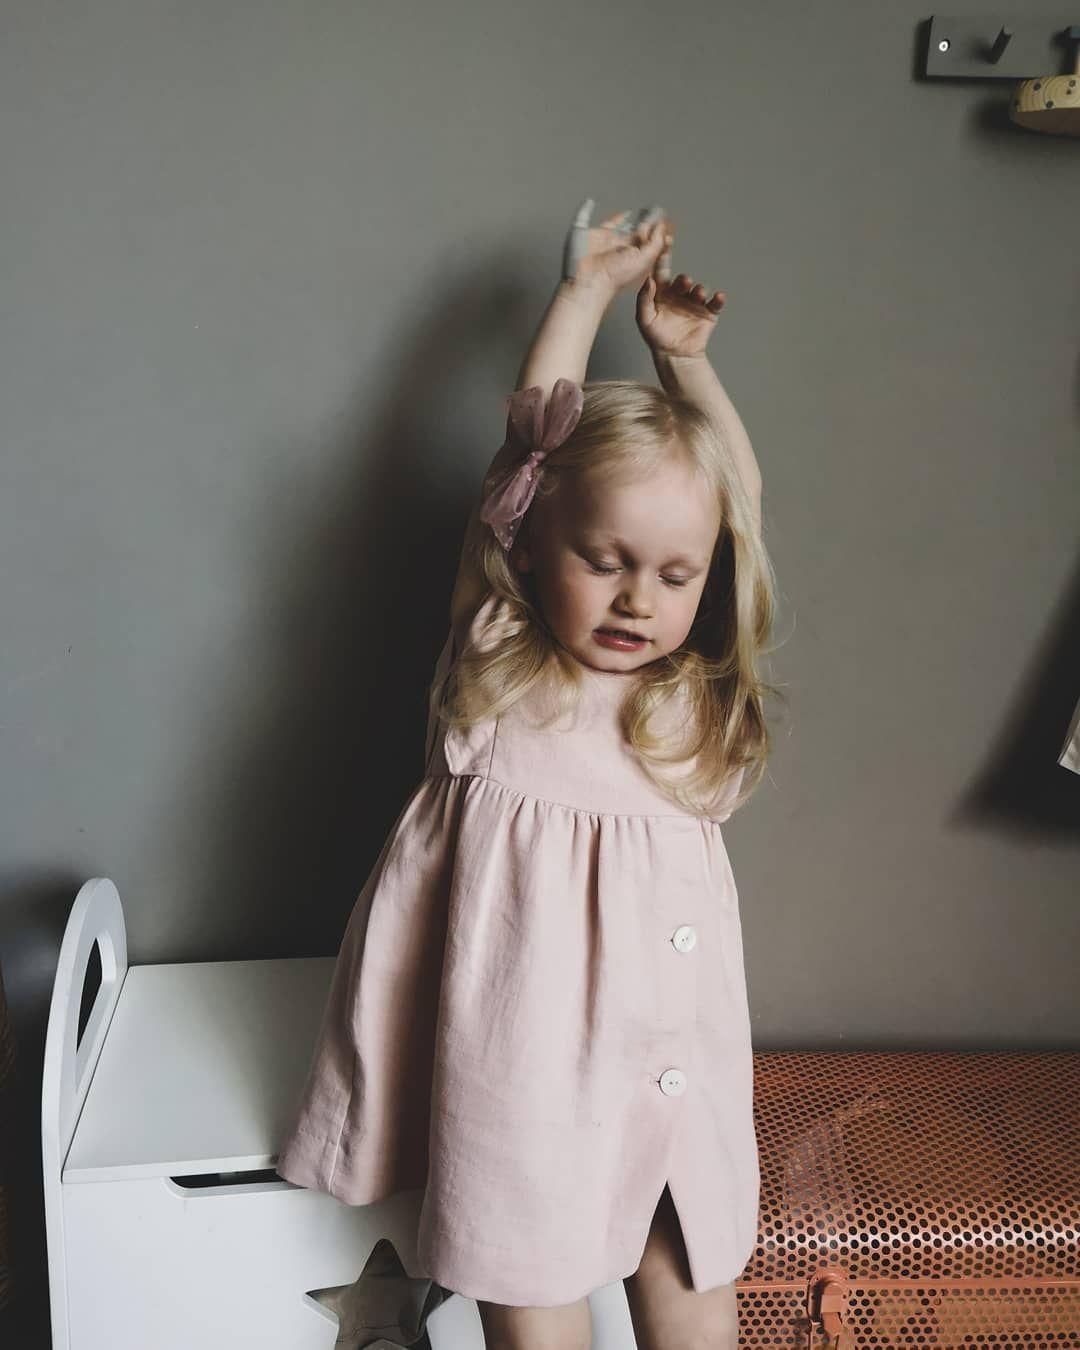 Сегодня погода - полное блаженство! Собираю корзину для пикника, и на залив 🐚🦋 . . . . . . . . . . . . . #childrenseemagic#pixel_kids#childofig#kidsmood#minimodel#bicfp#kidsphoto#фотодети#jj_its_kids#kidsstyle#cutekids#kids_of_our_world#kidsforreal#clickinmoms#ig_motherhood#motherhoodsimplified#motherhoodsimplified#lookslikefilmkids#доченькамоя#дневникмамы#fashionkidsbabies#_kids_photos#momswithcameras#kidzootd_#celebrate_childhood#childhoodwonders#thelifestylecollective#lifewithkids#zarakids#